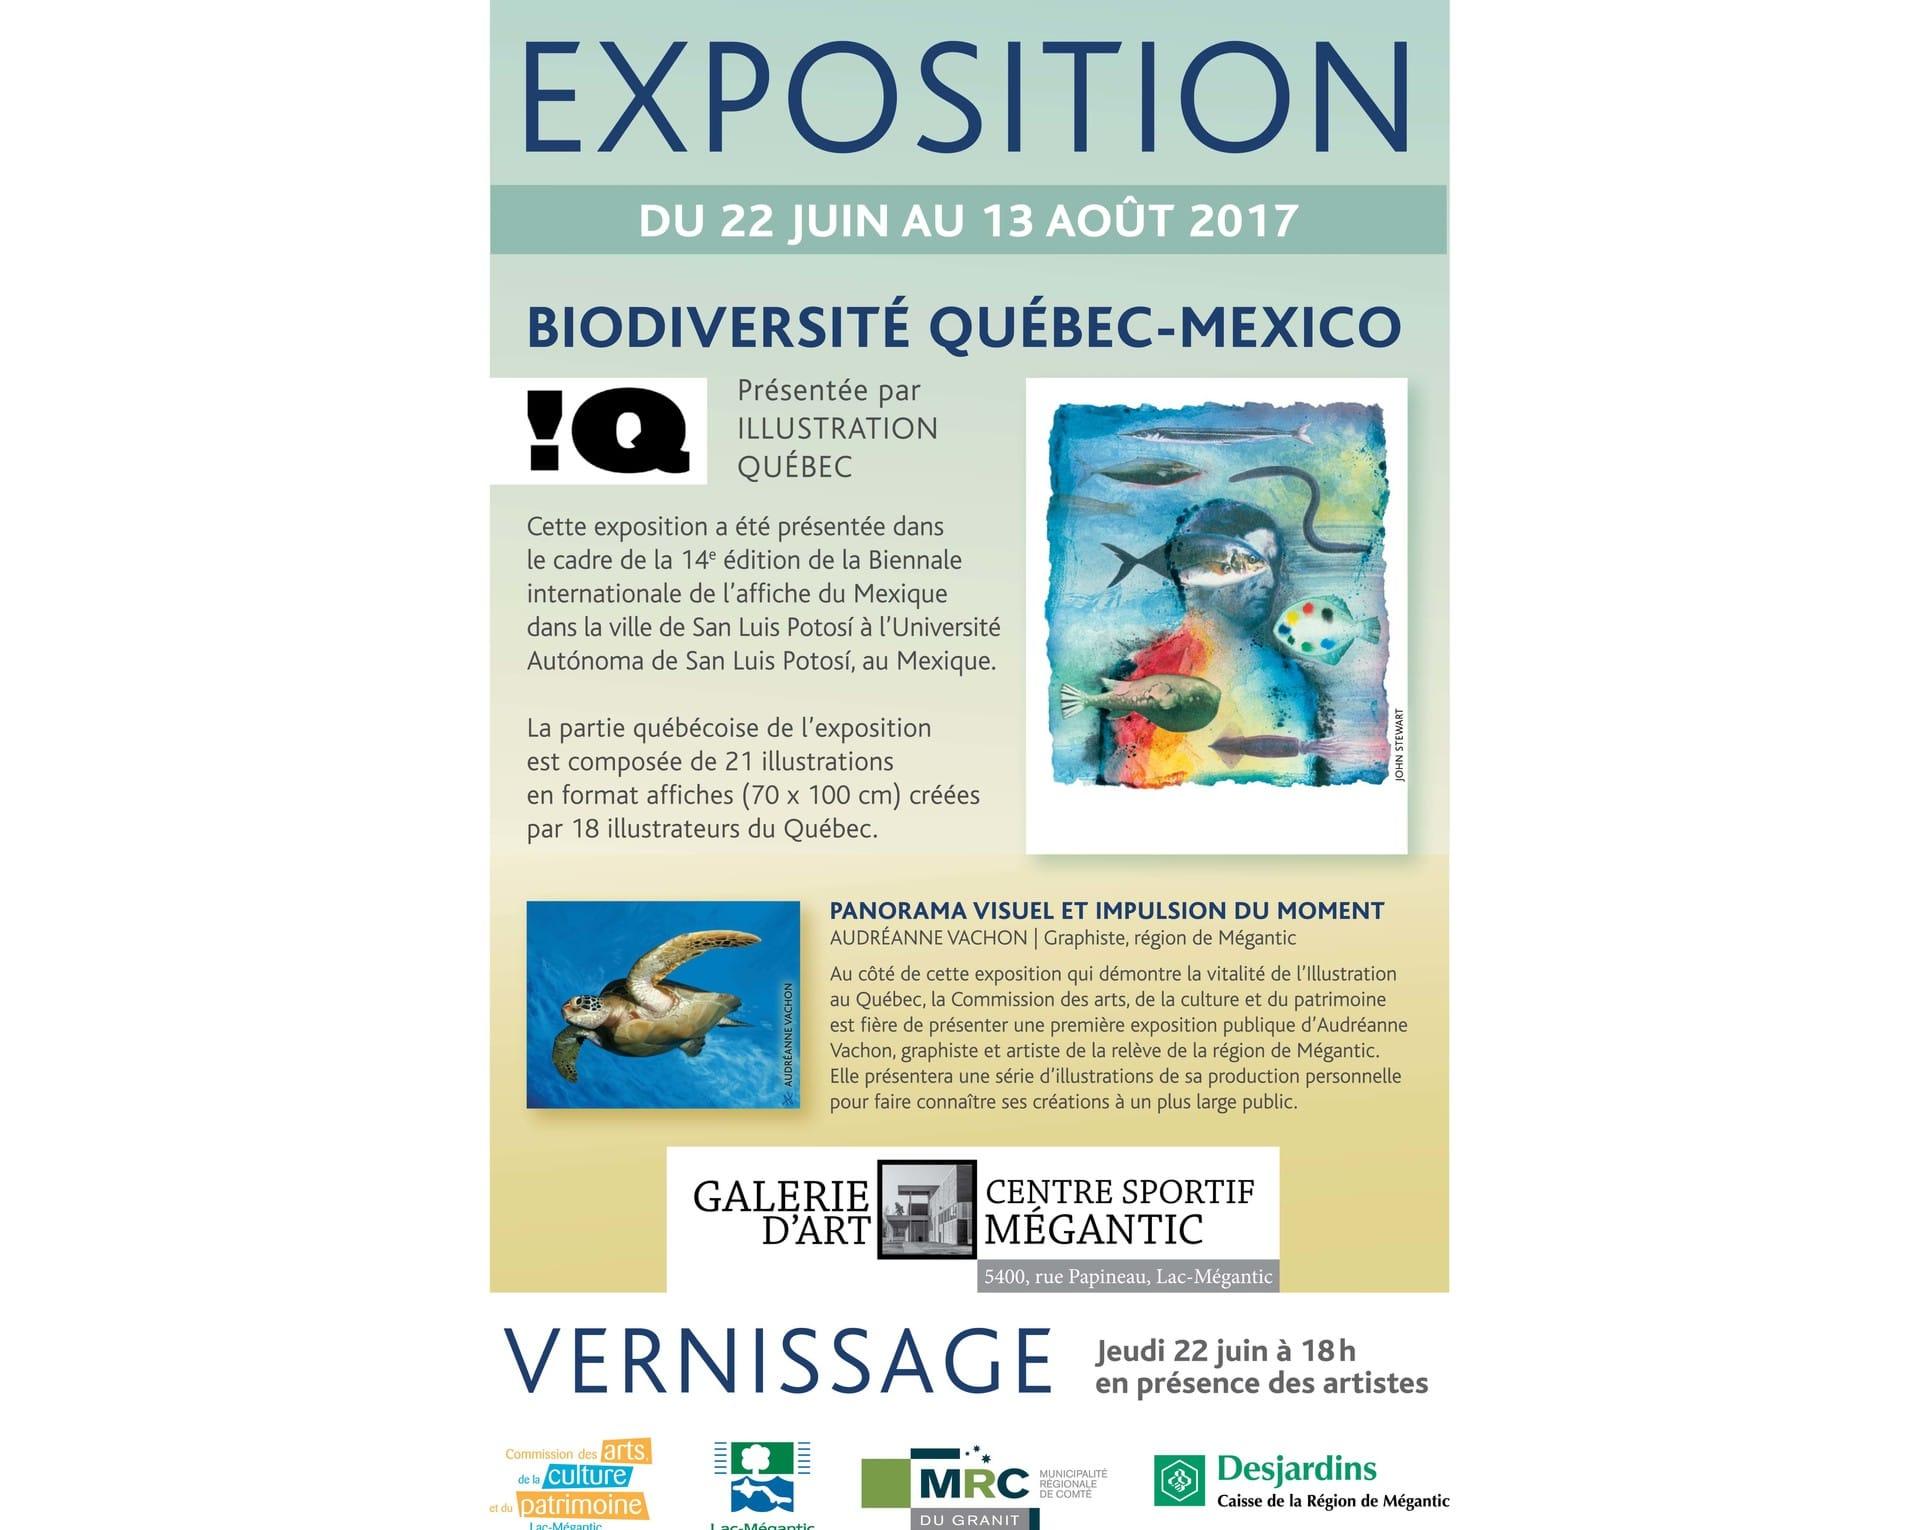 Biodiversité Québec-Mexico